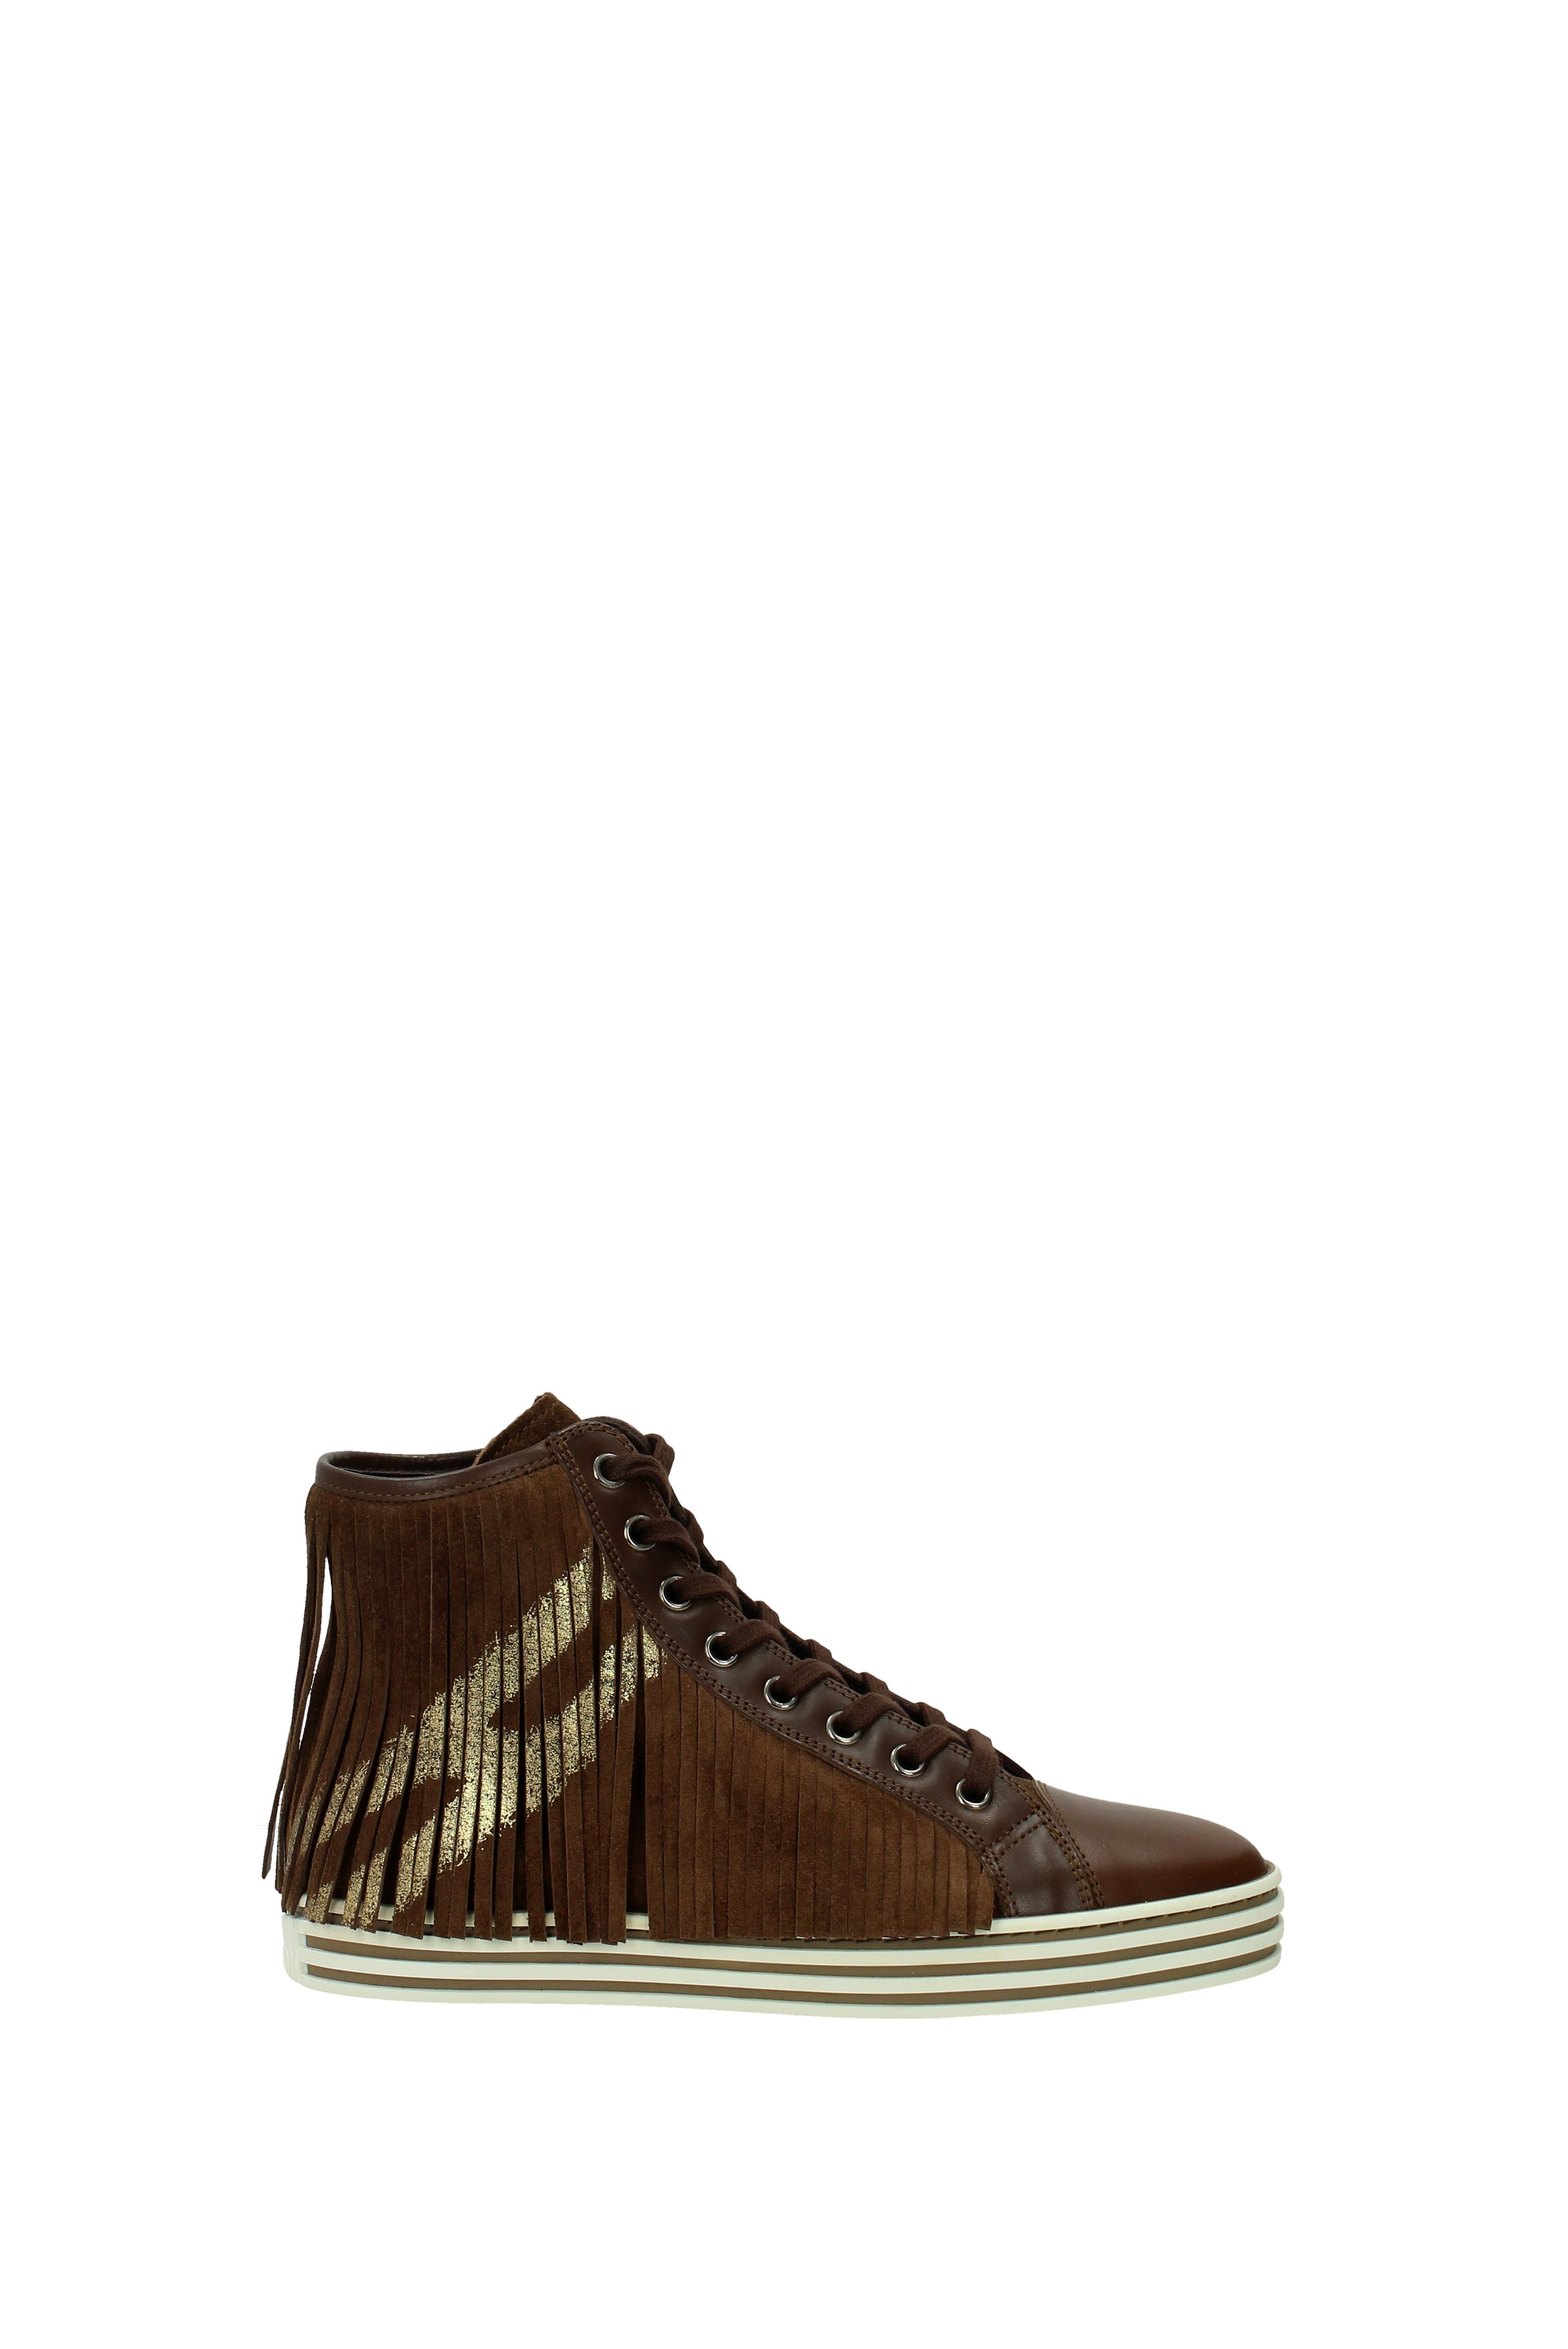 Sneakers Hogan Donna rebel Donna Hogan - Camoscio (HXW1410O3901ZBS) 997dbd